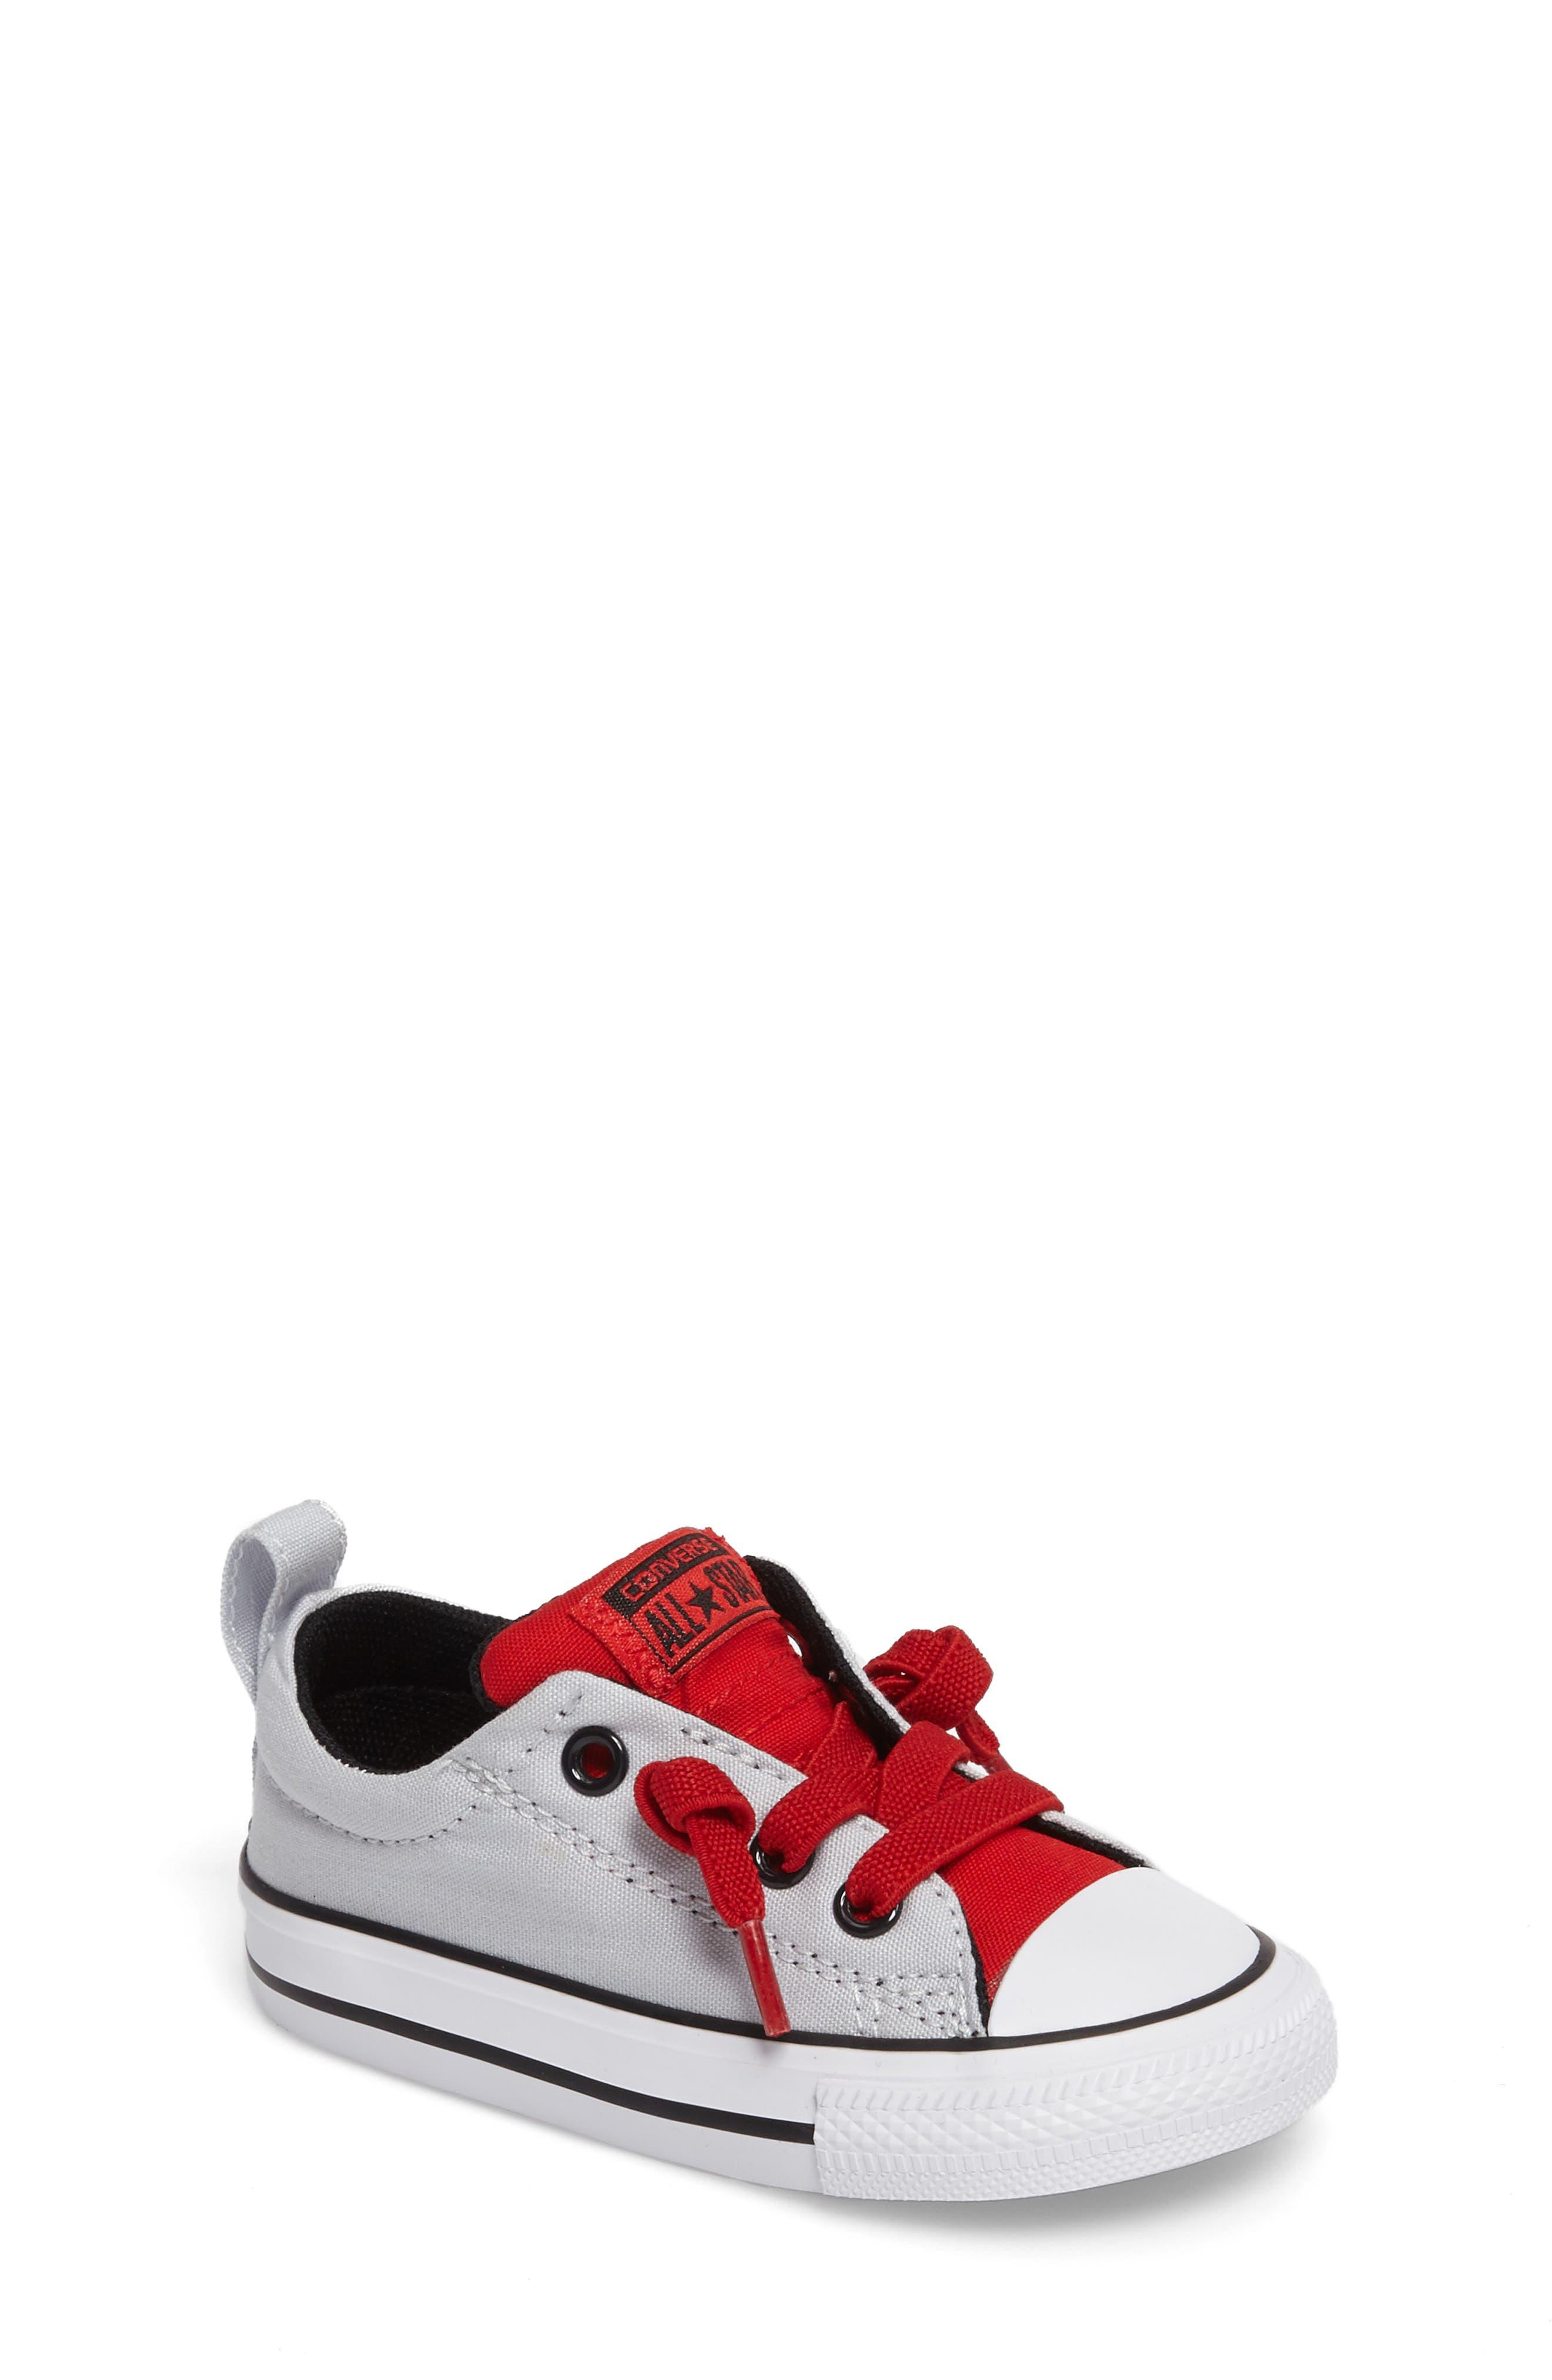 All Star<sup>®</sup> Street Slip Low Top Sneaker,                         Main,                         color, 040